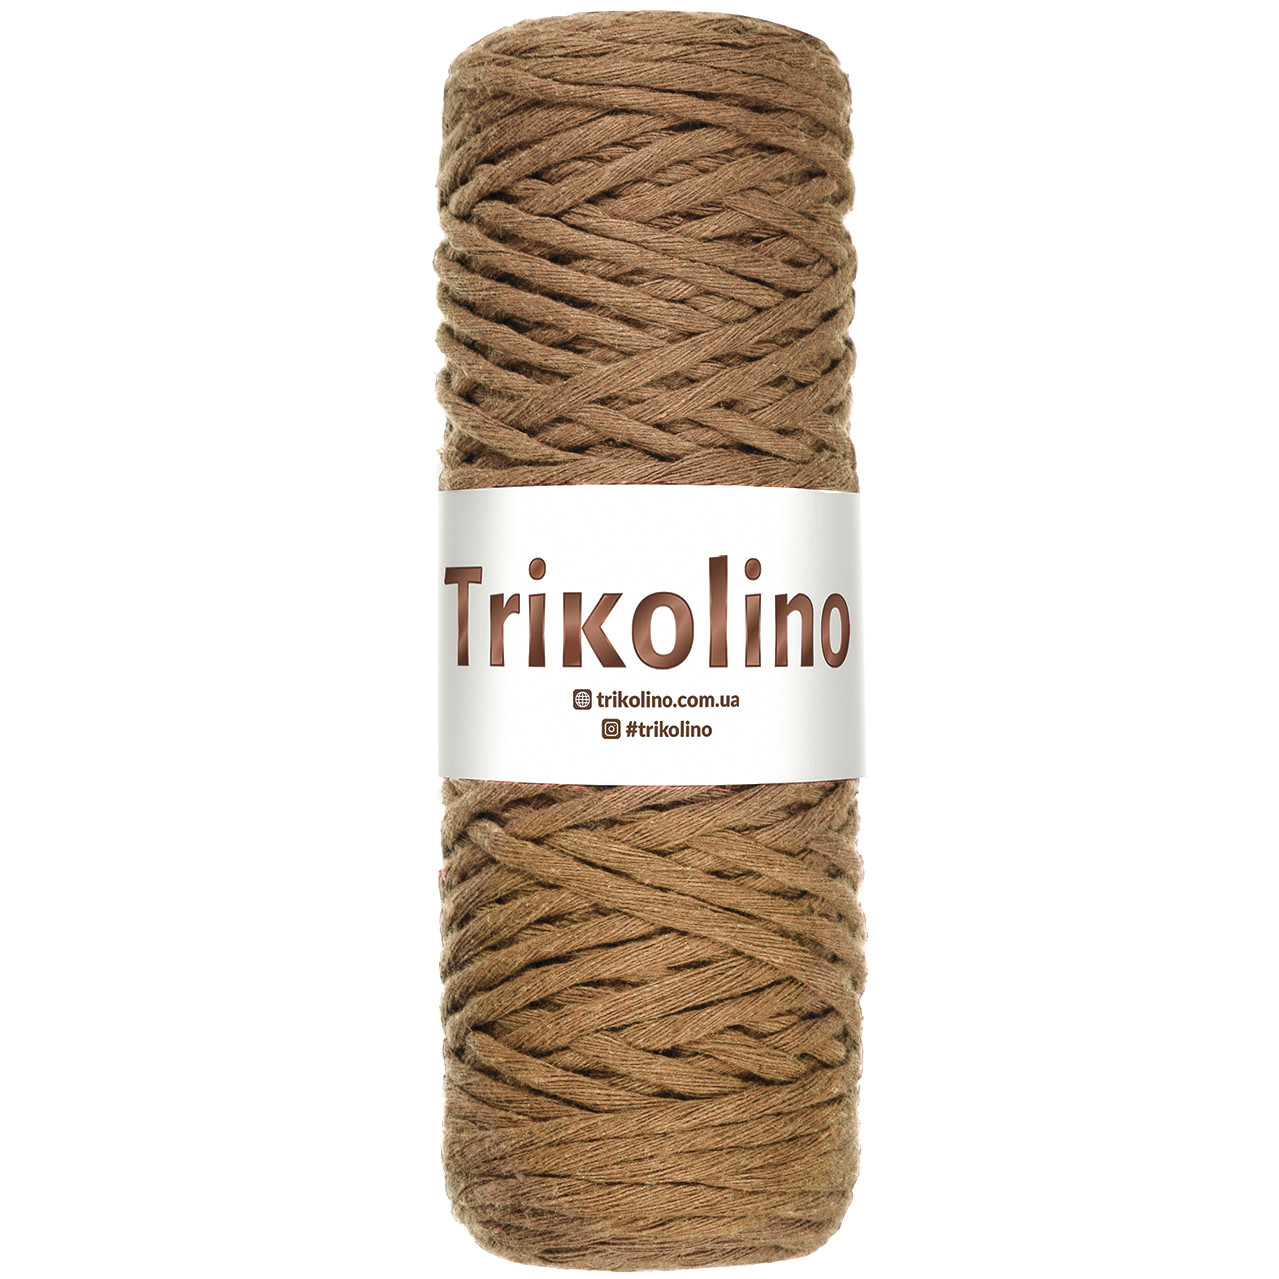 Шнур для макраме Trikolino Браун 4-6мм